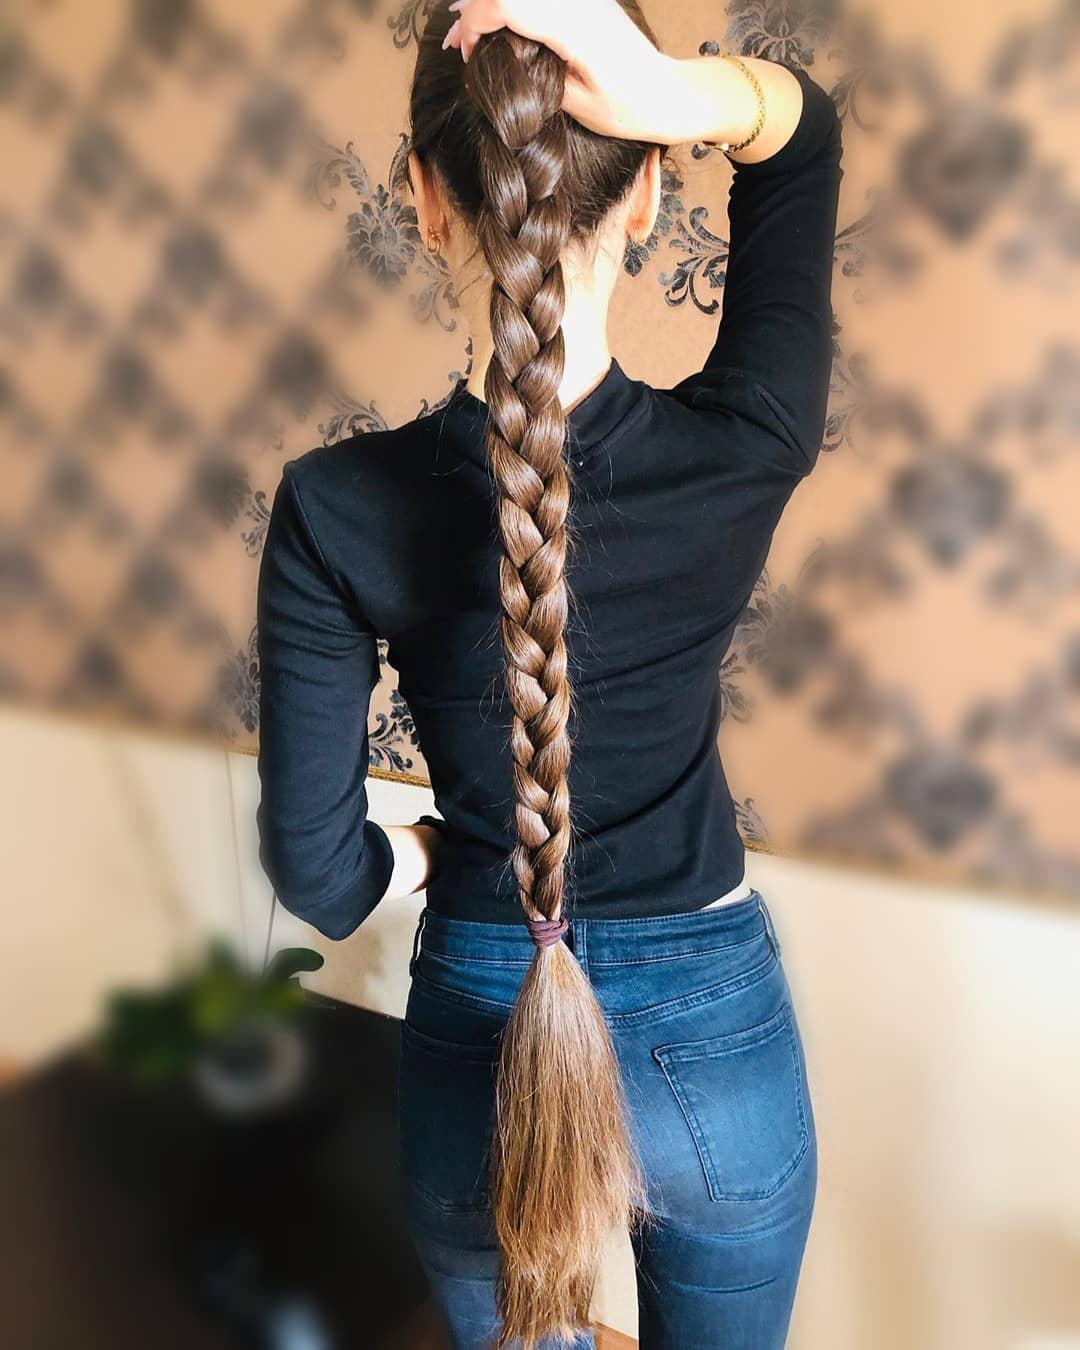 Updated 38 Luscious Long Hair Braided Hairstyles August 2020